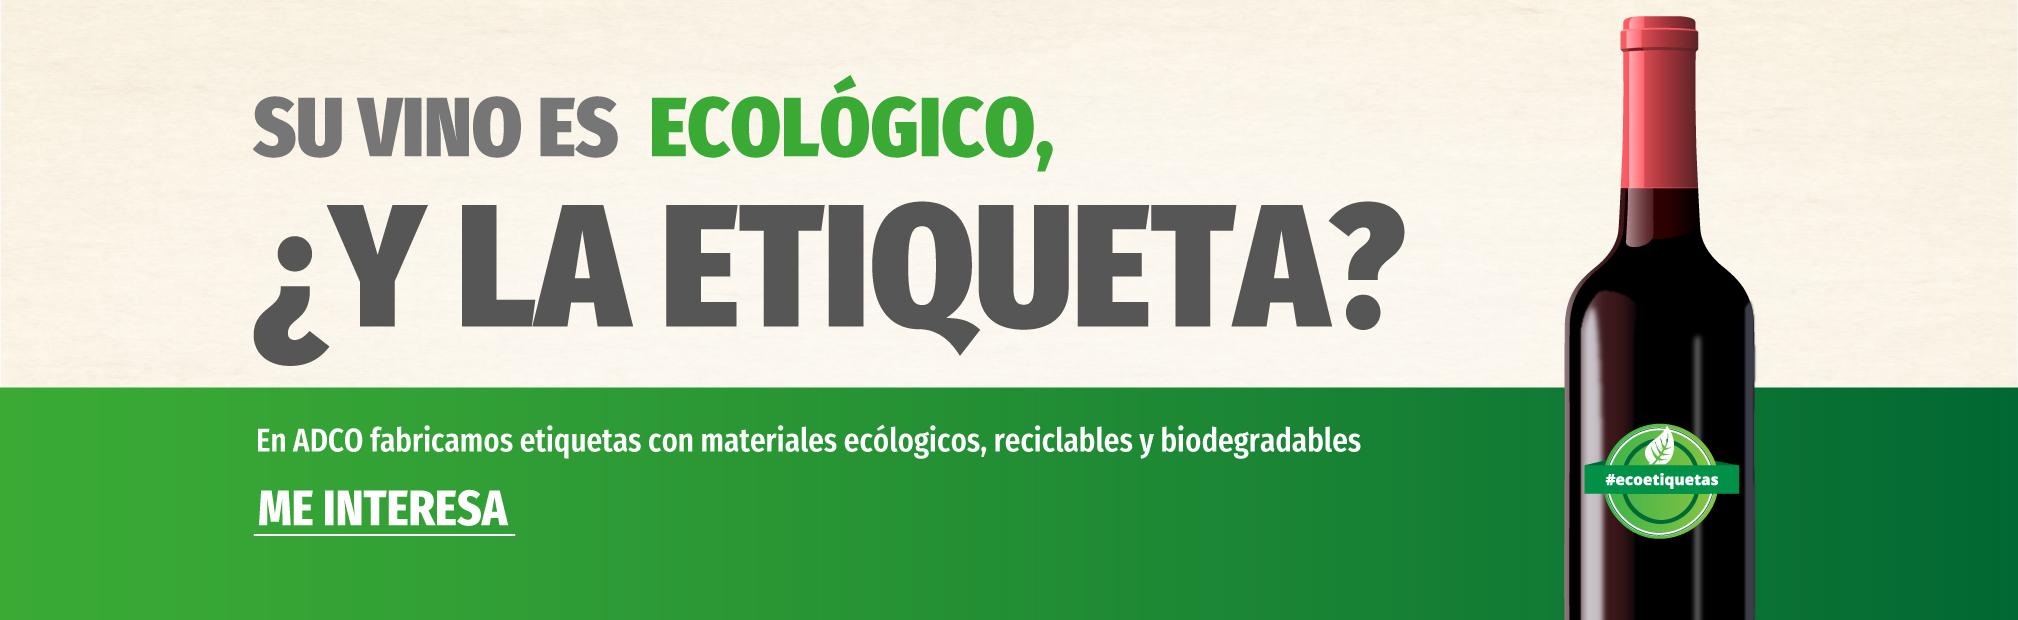 fba15d9a7dcb ADCO - Fábrica de etiquetas adhesivas – Etiquetaje Industrial